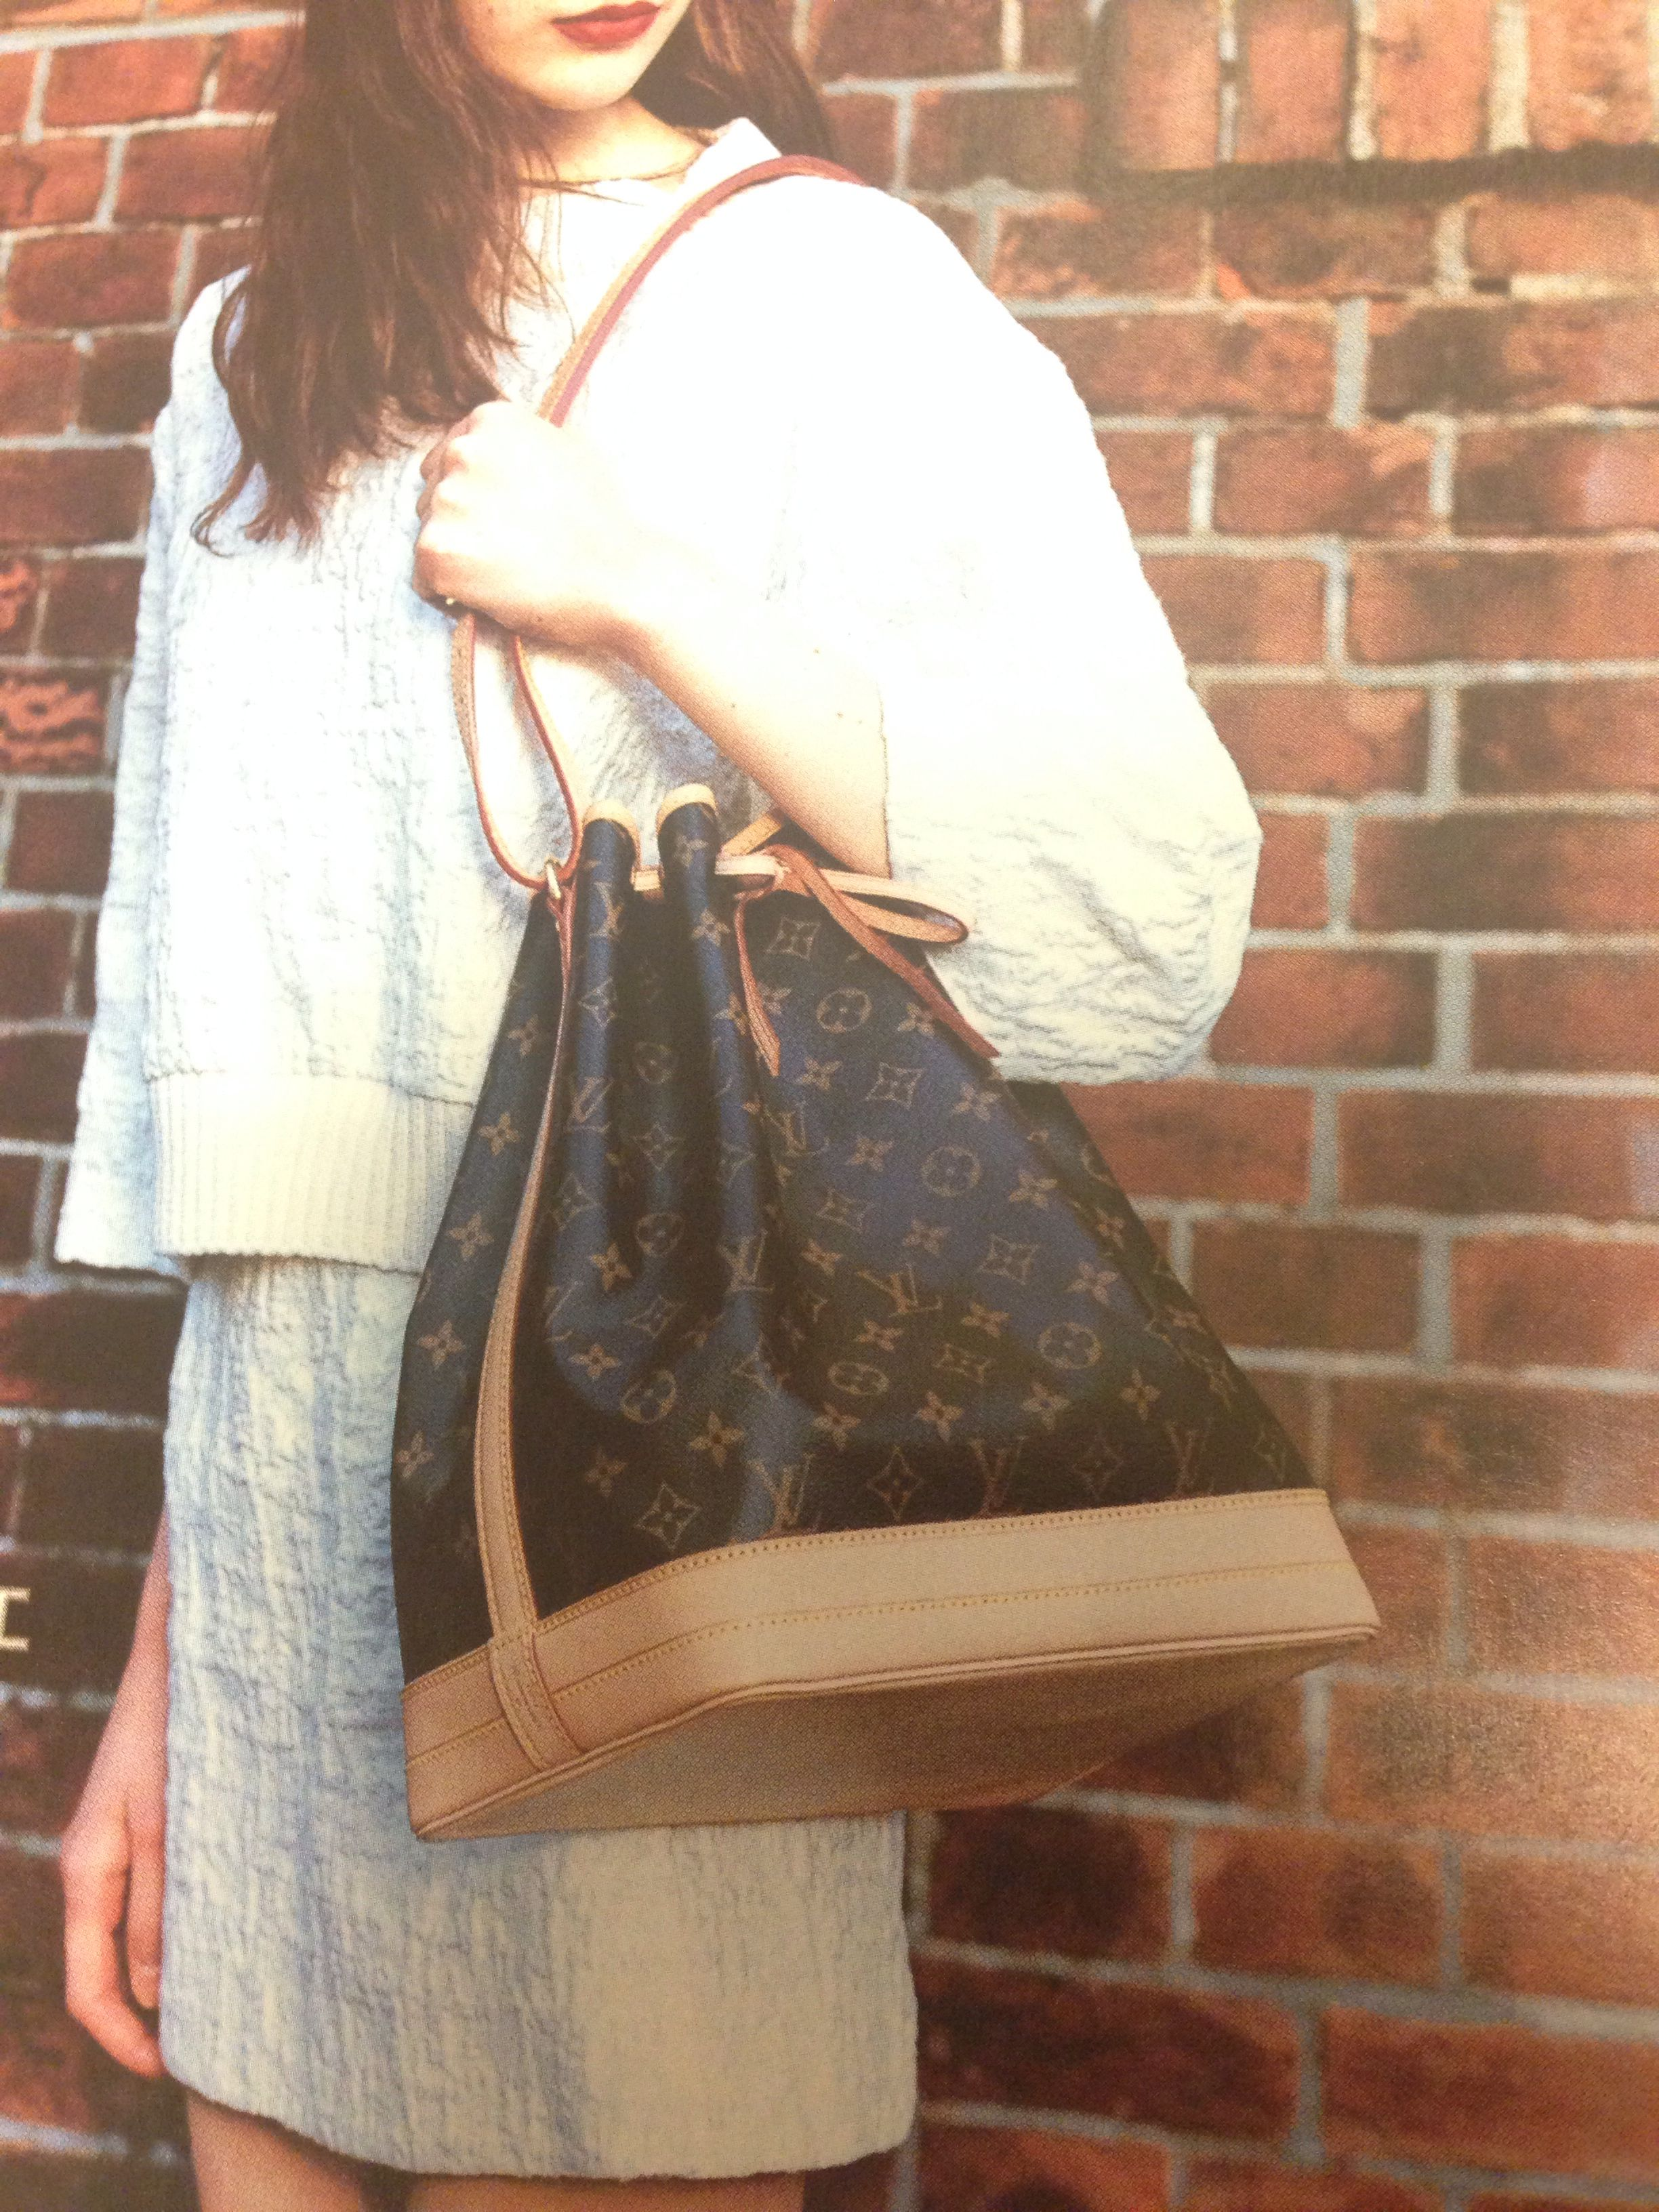 Louis Vuitton Noe Noe Louis Vuitton Fashion Louis Vuitton Handbags